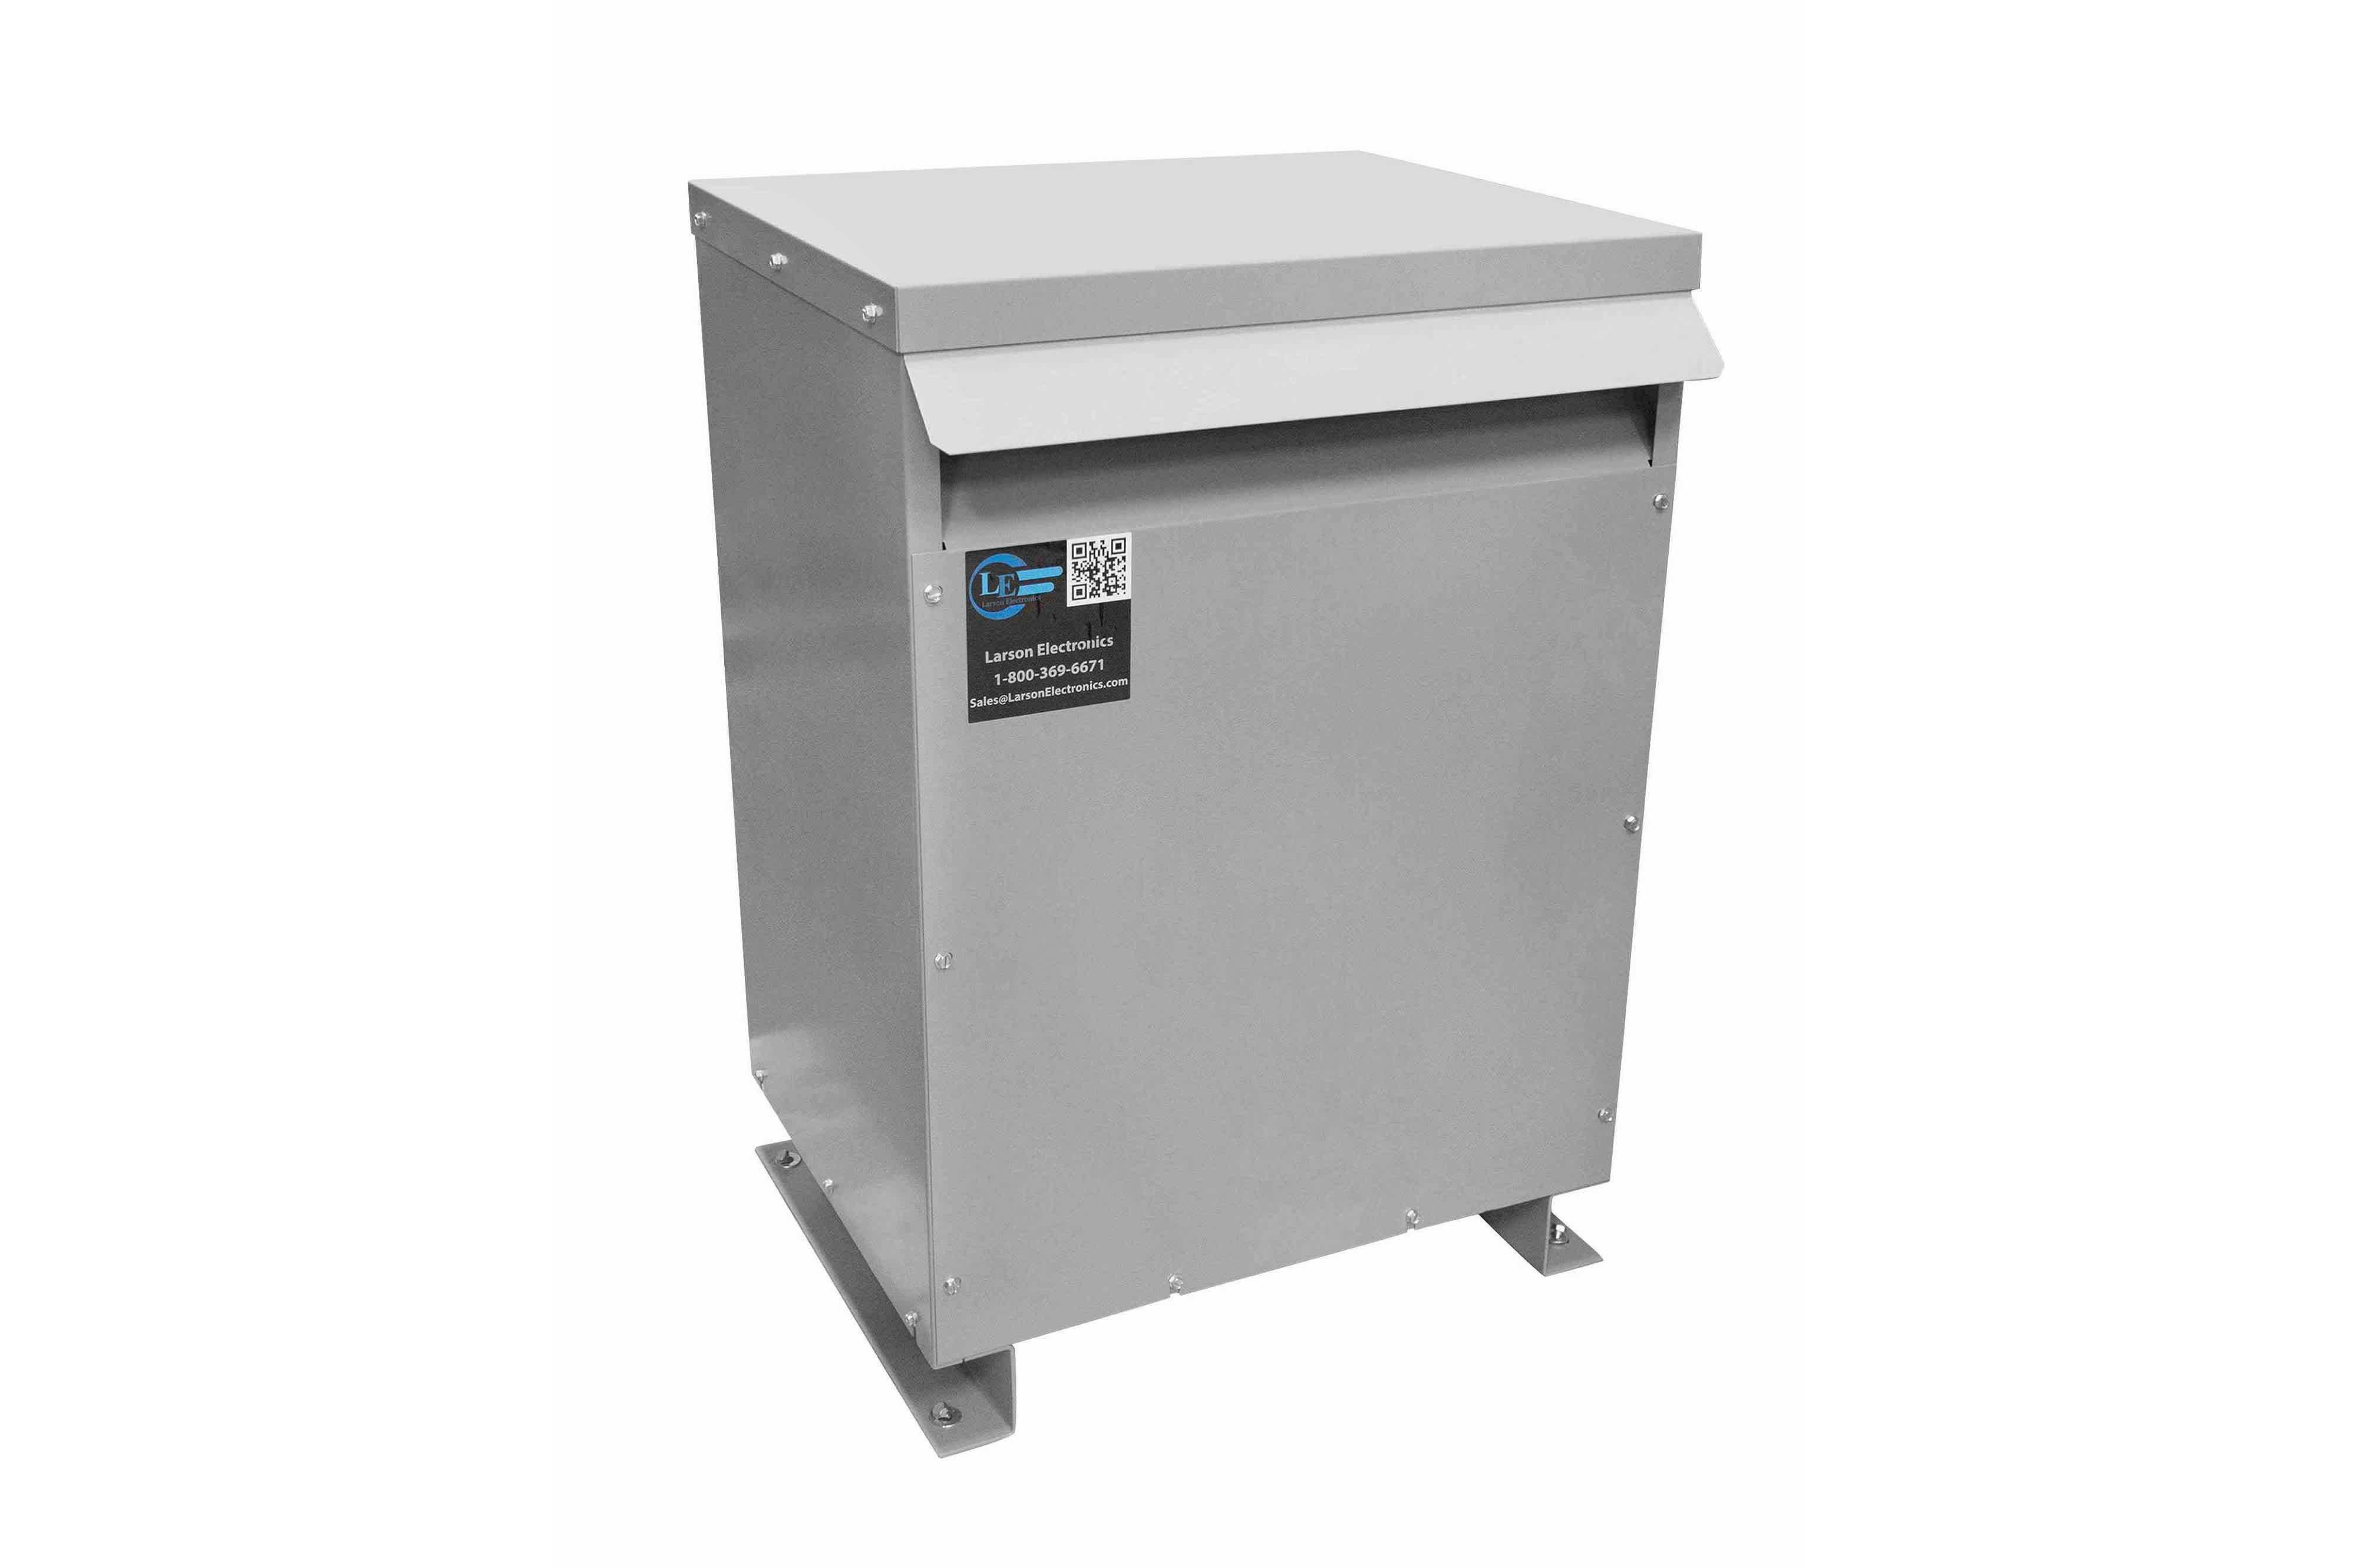 10 kVA 3PH Isolation Transformer, 400V Wye Primary, 208Y/120 Wye-N Secondary, N3R, Ventilated, 60 Hz